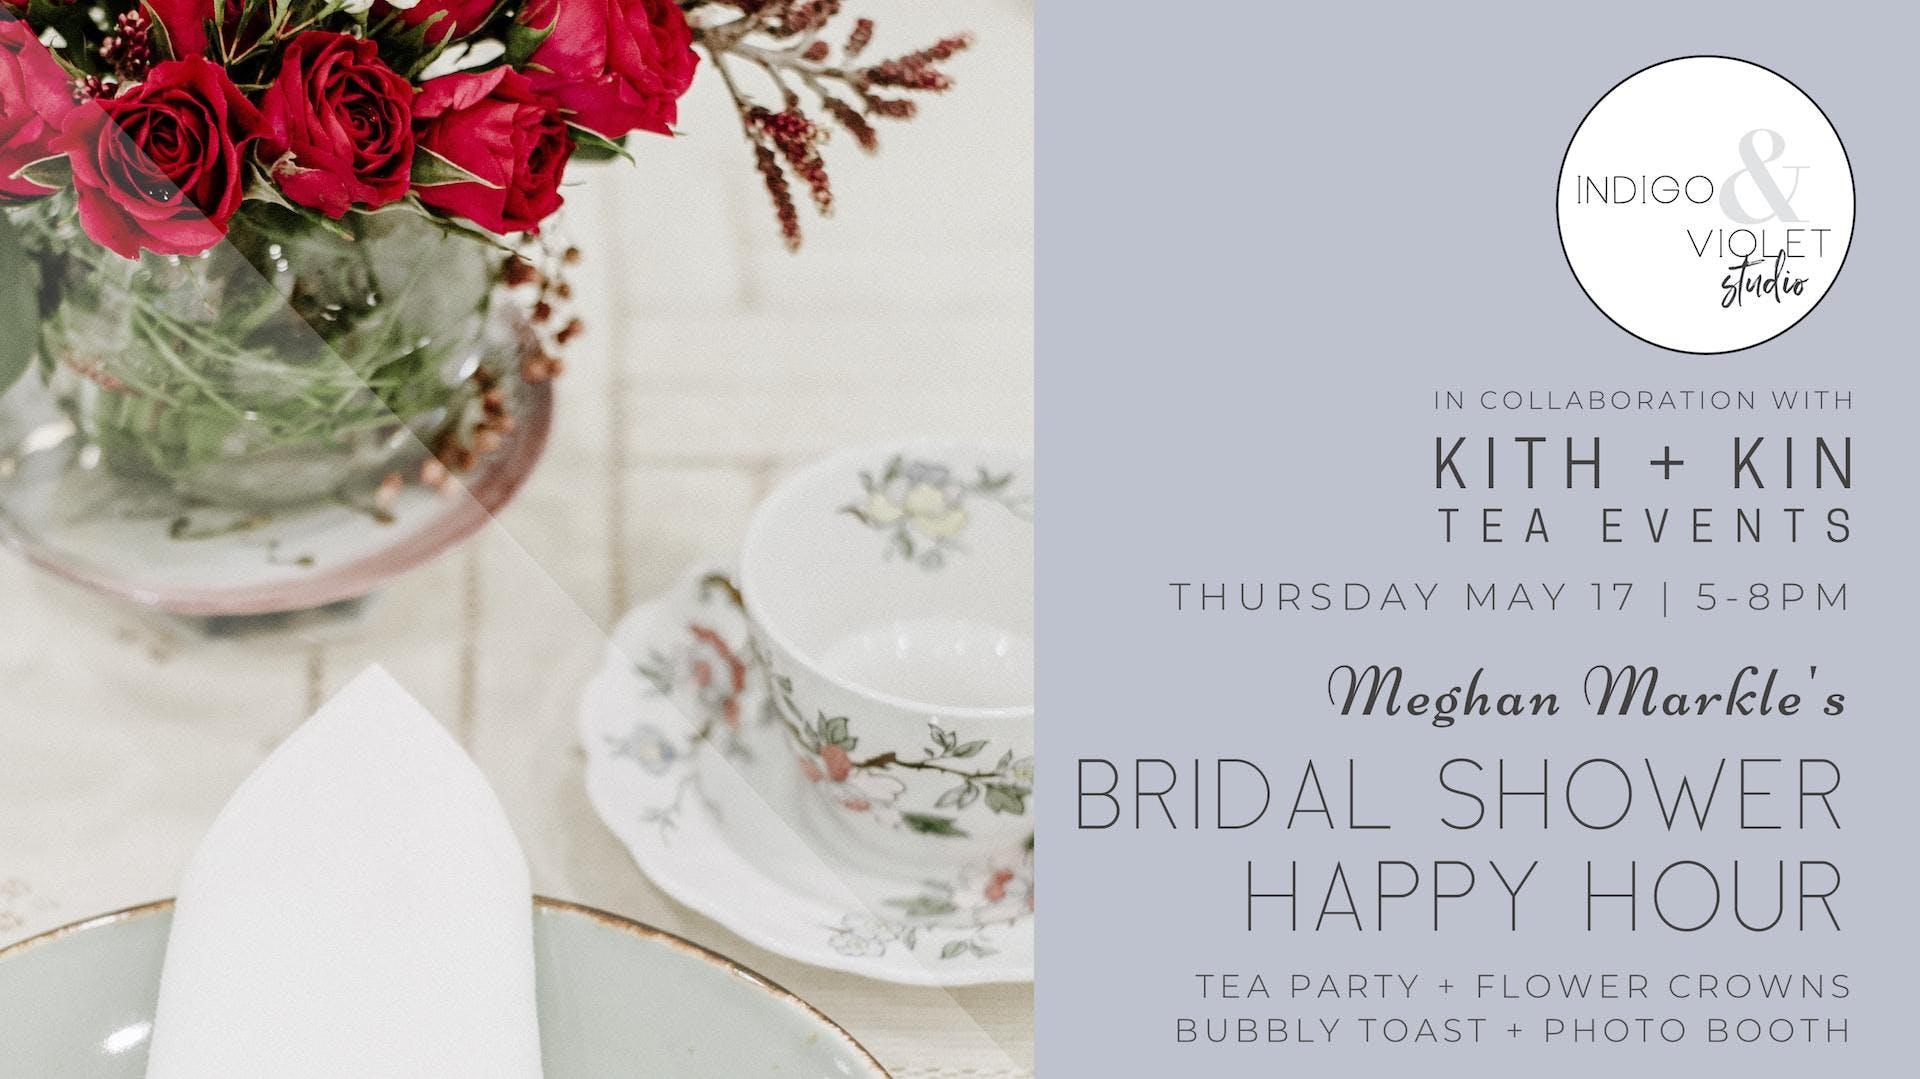 Royal Bridal Shower Happy Hour